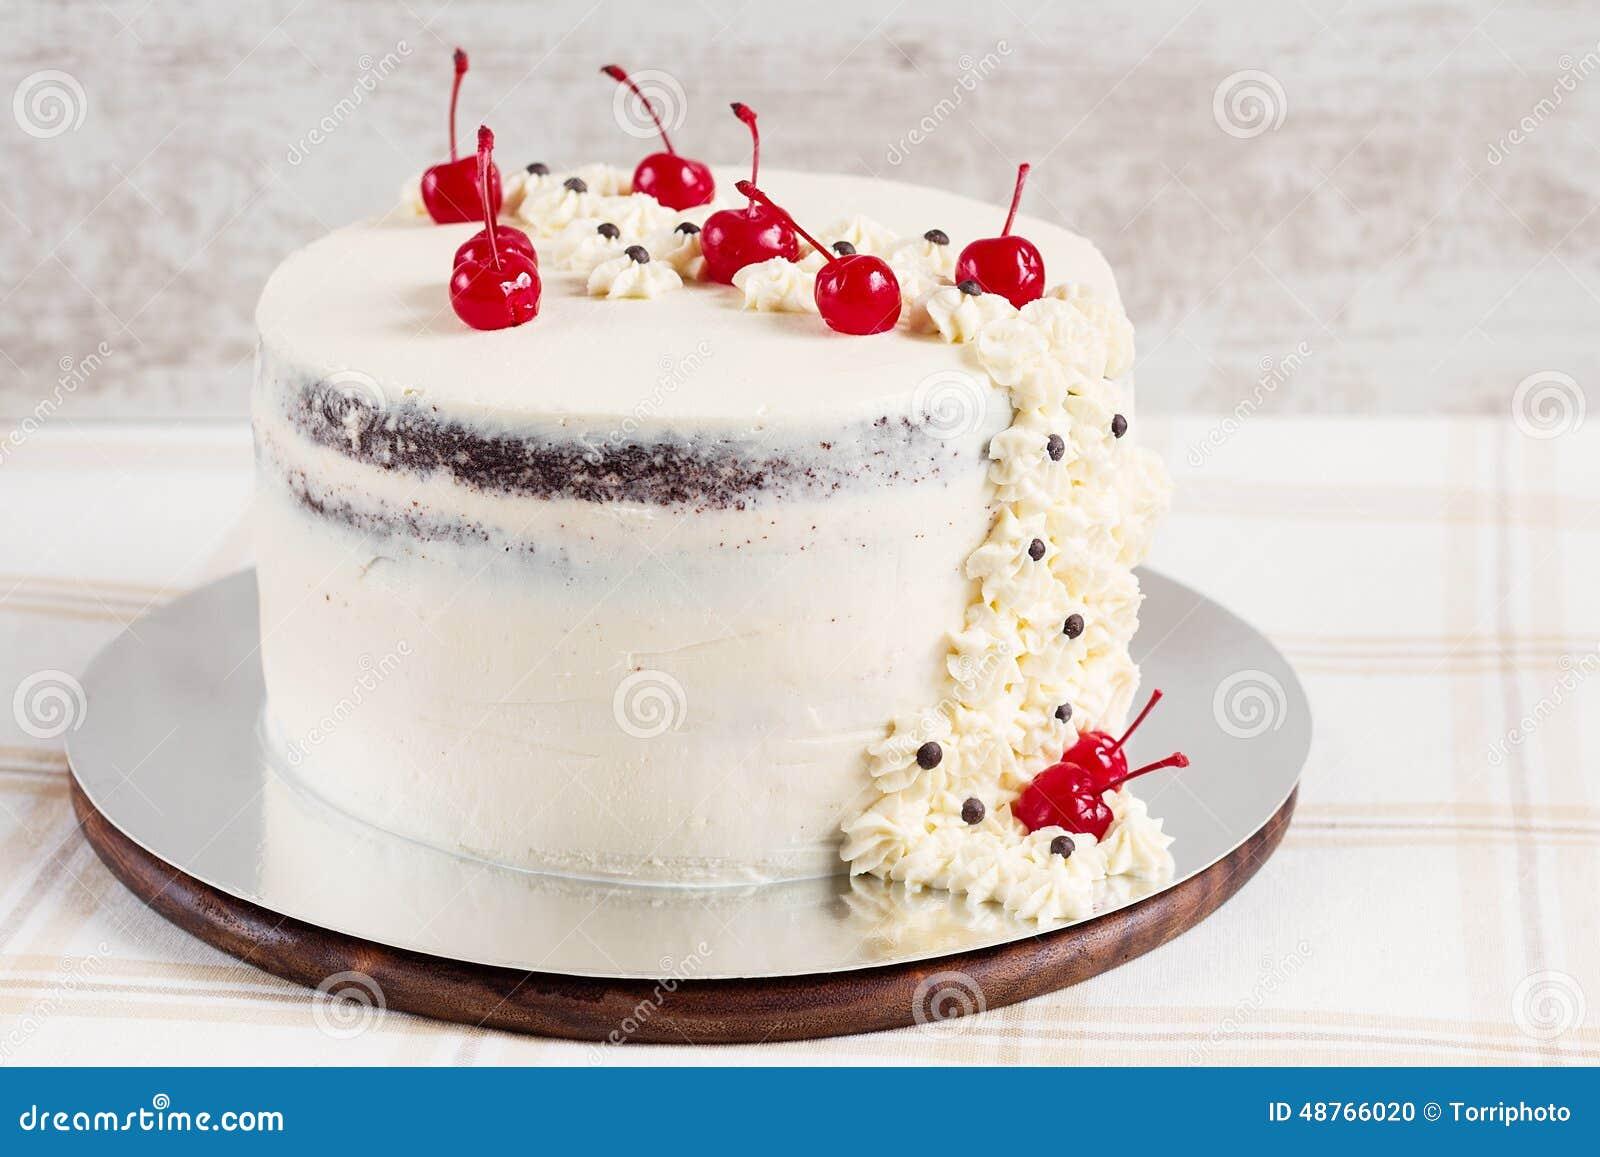 Rustic wedding cake stock photo. Image of dessert, orange - 48766020